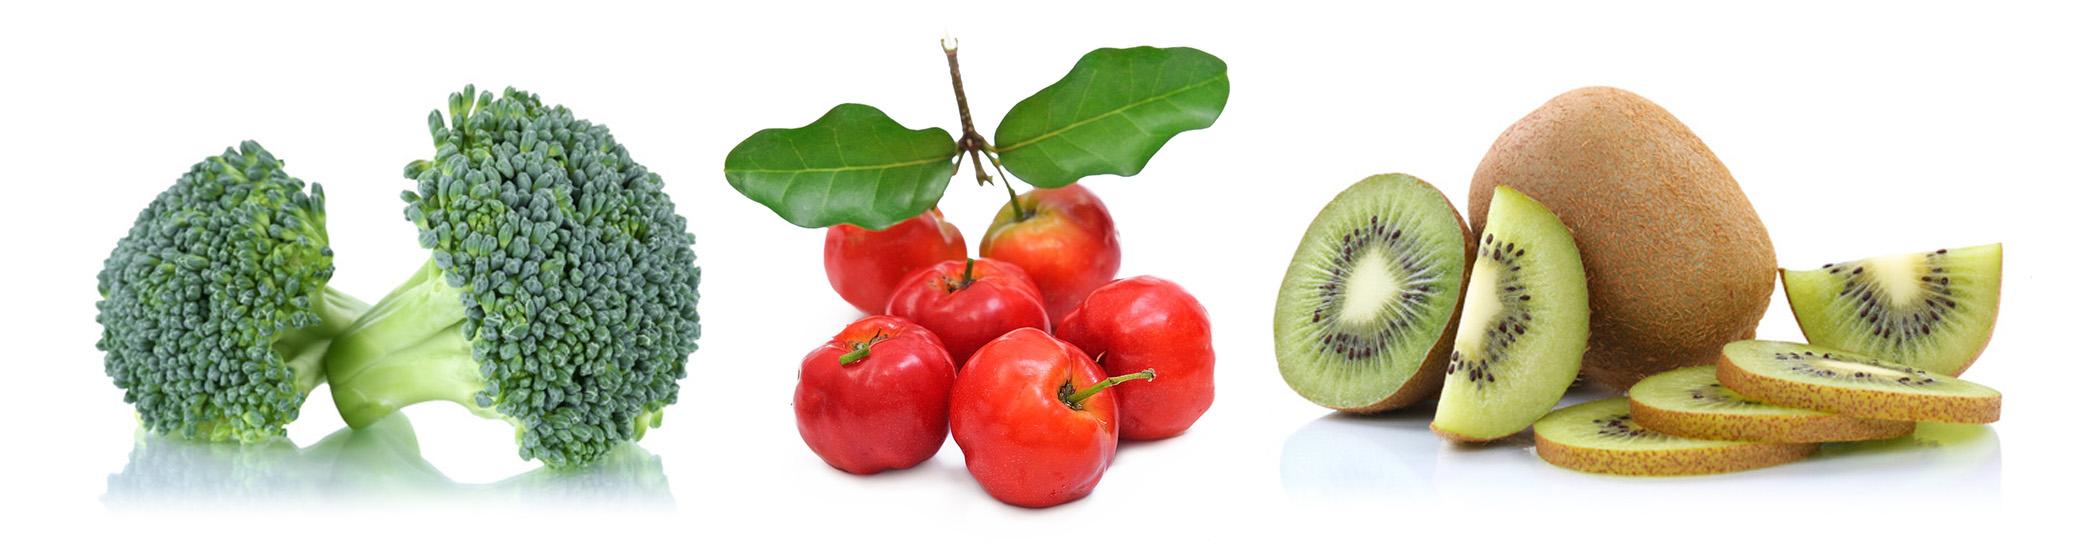 Top-10 Vitamin C Lieferanten Brokkoli_Acerola_Kiwi